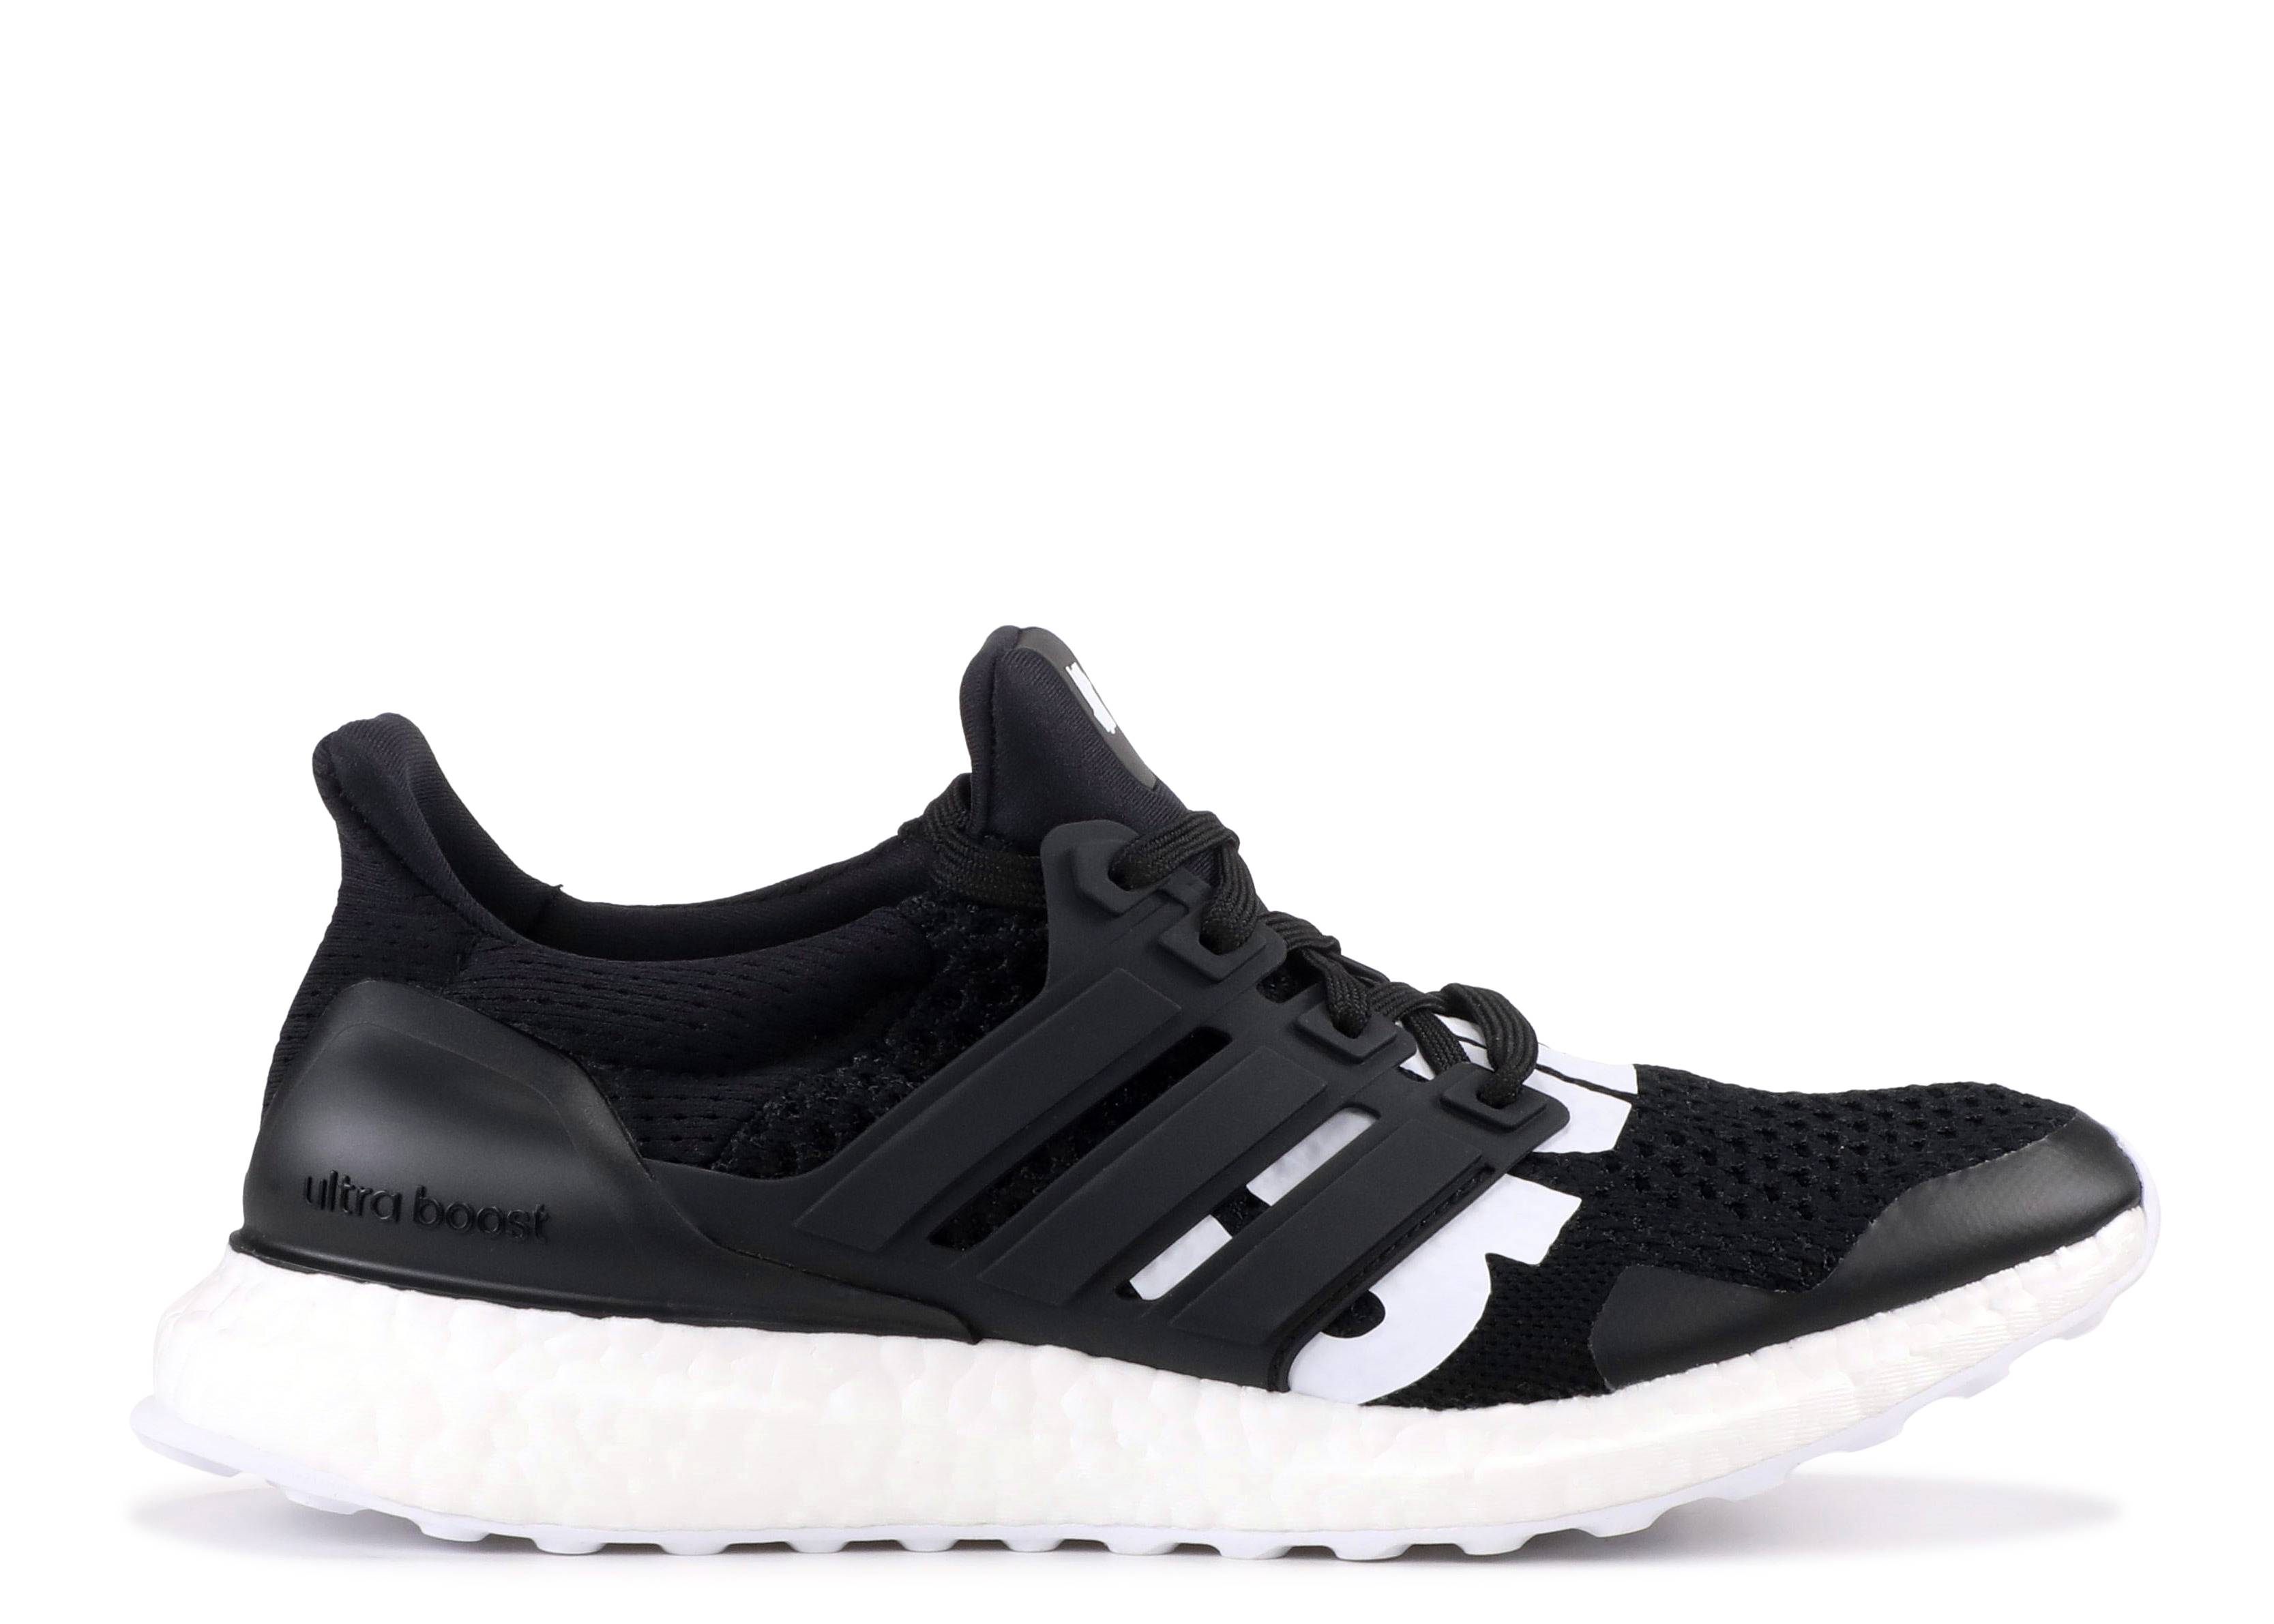 Assassino Assurdo Rifiutare  Ultraboost Undftd 'undefeated' - Adidas - B22480 - core black/core  black/footwear white | Flight Club